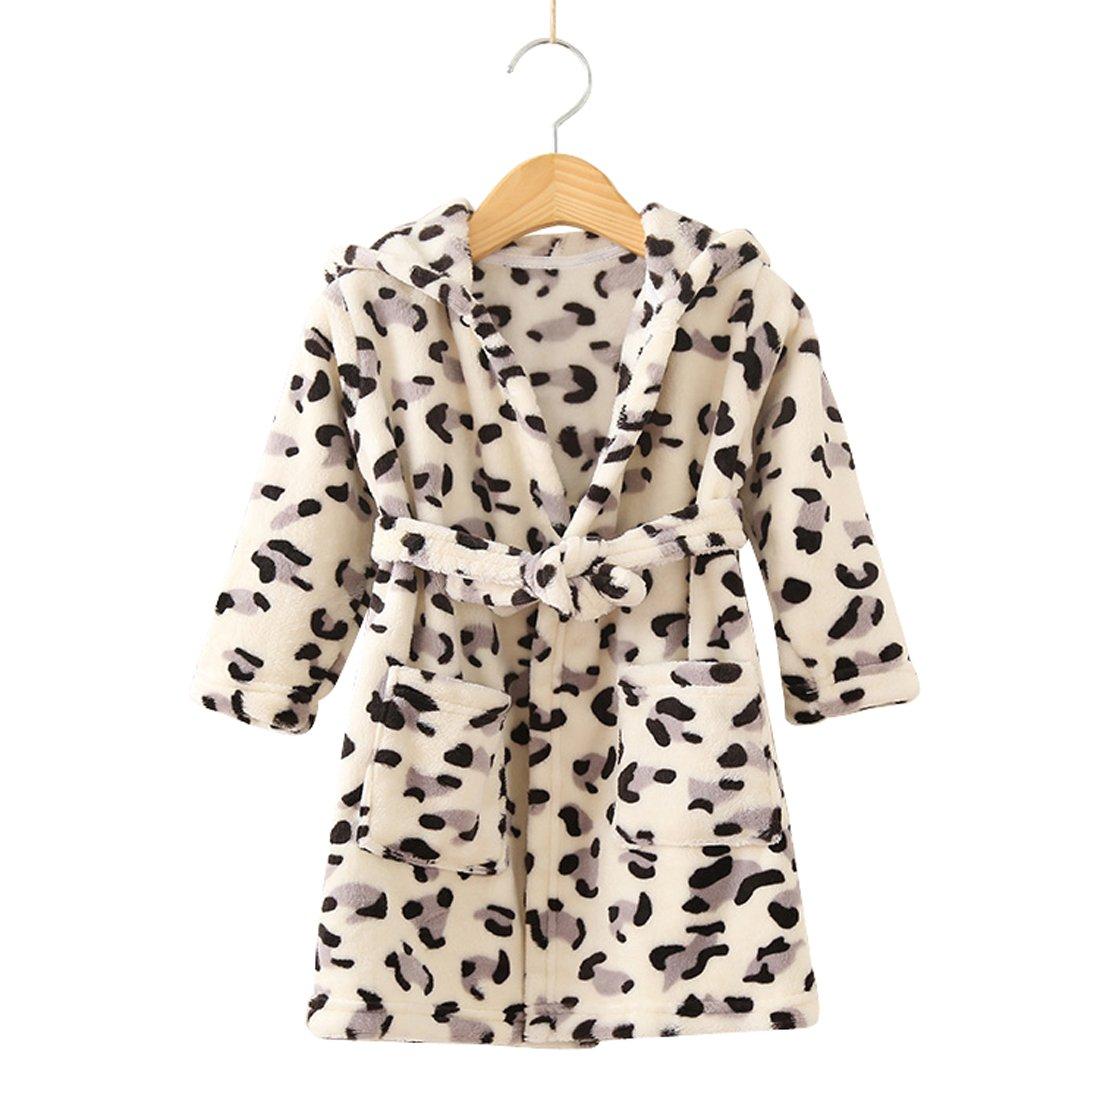 Toddlers/kids Hooded Robe Soft Fleece Bathrobe Children Pajamas Baby plush robe